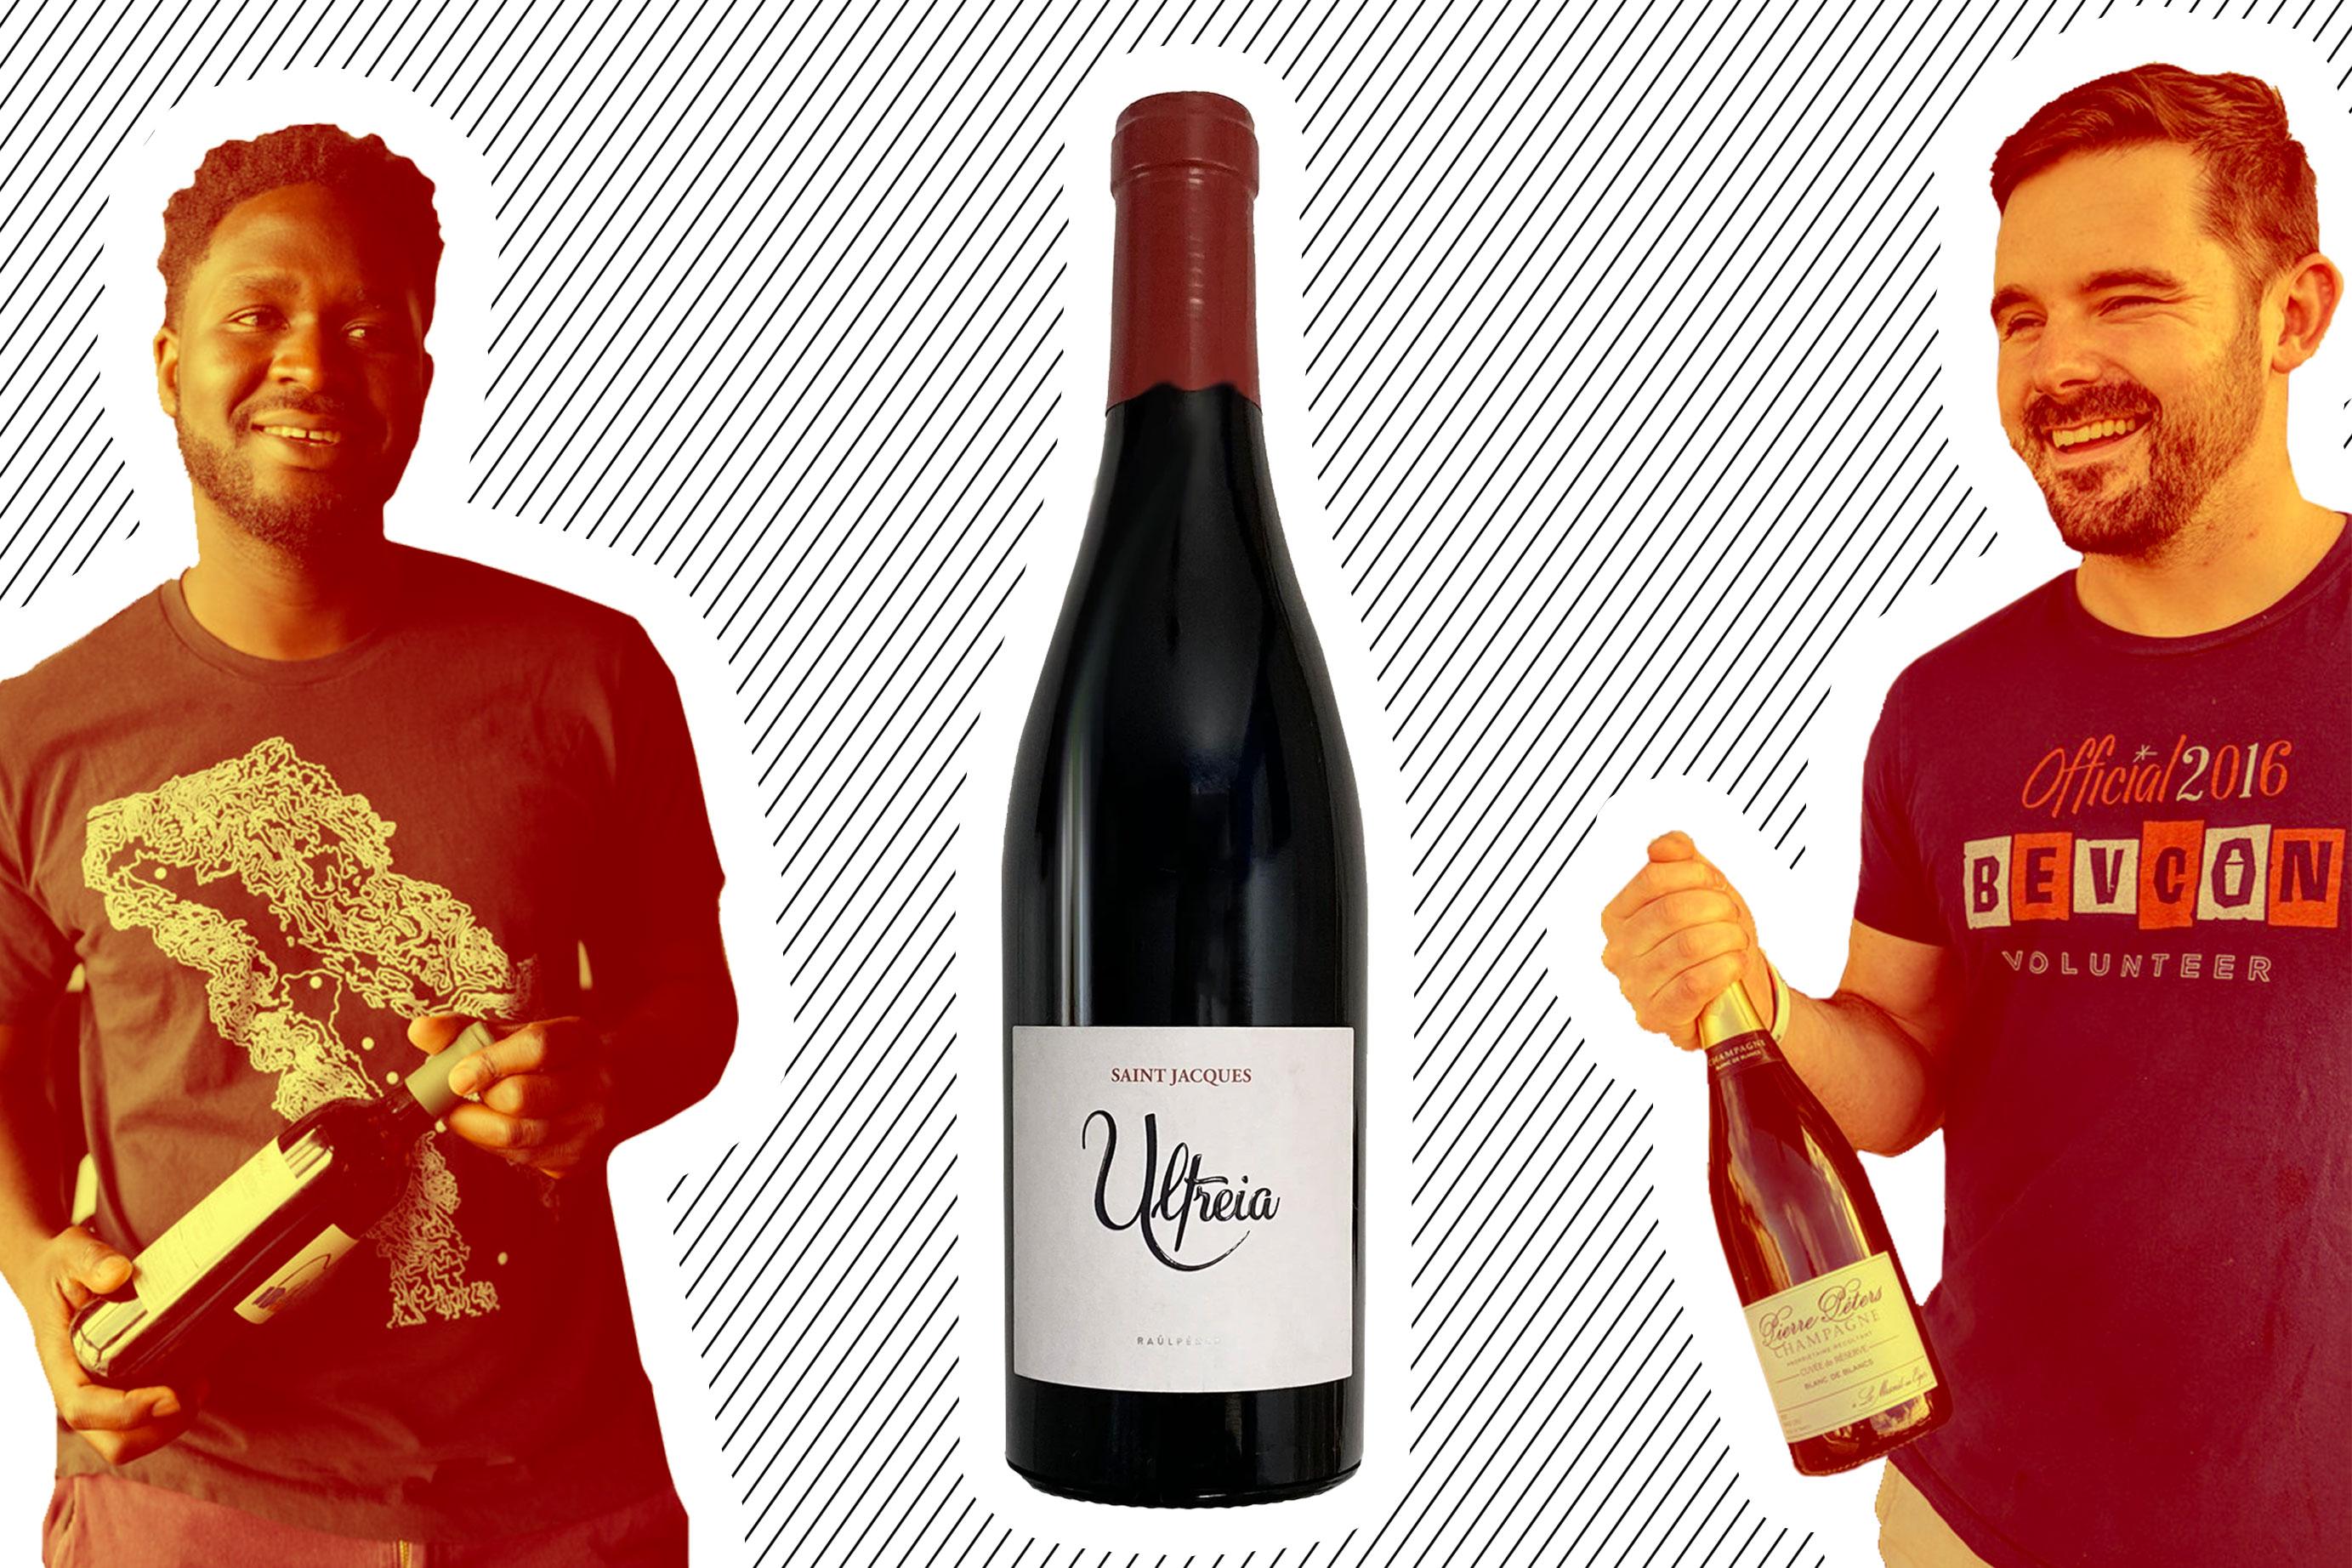 Thumb-Graft-Wine-Charleston-Raul-Perez-Bierzo-Ultreia-Saint-Jacques